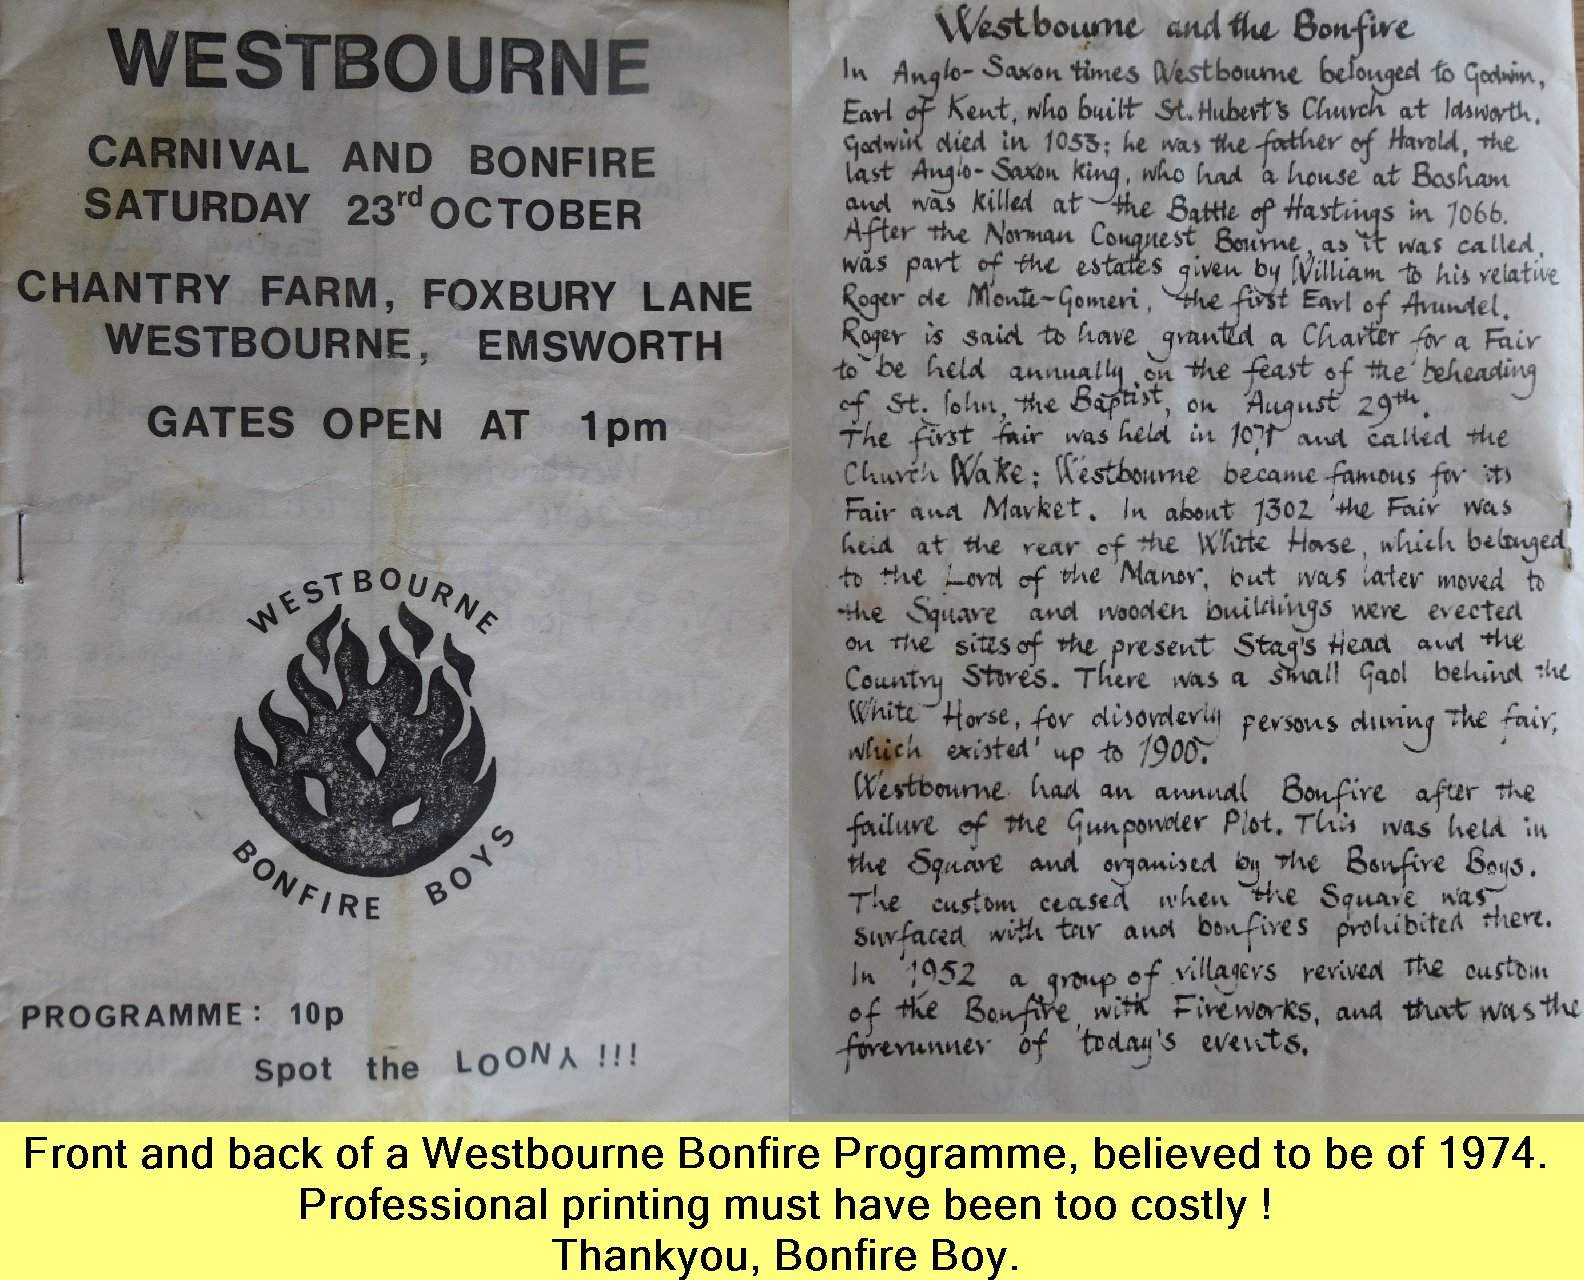 Westbourne Bonfire Programme 1974 - 1